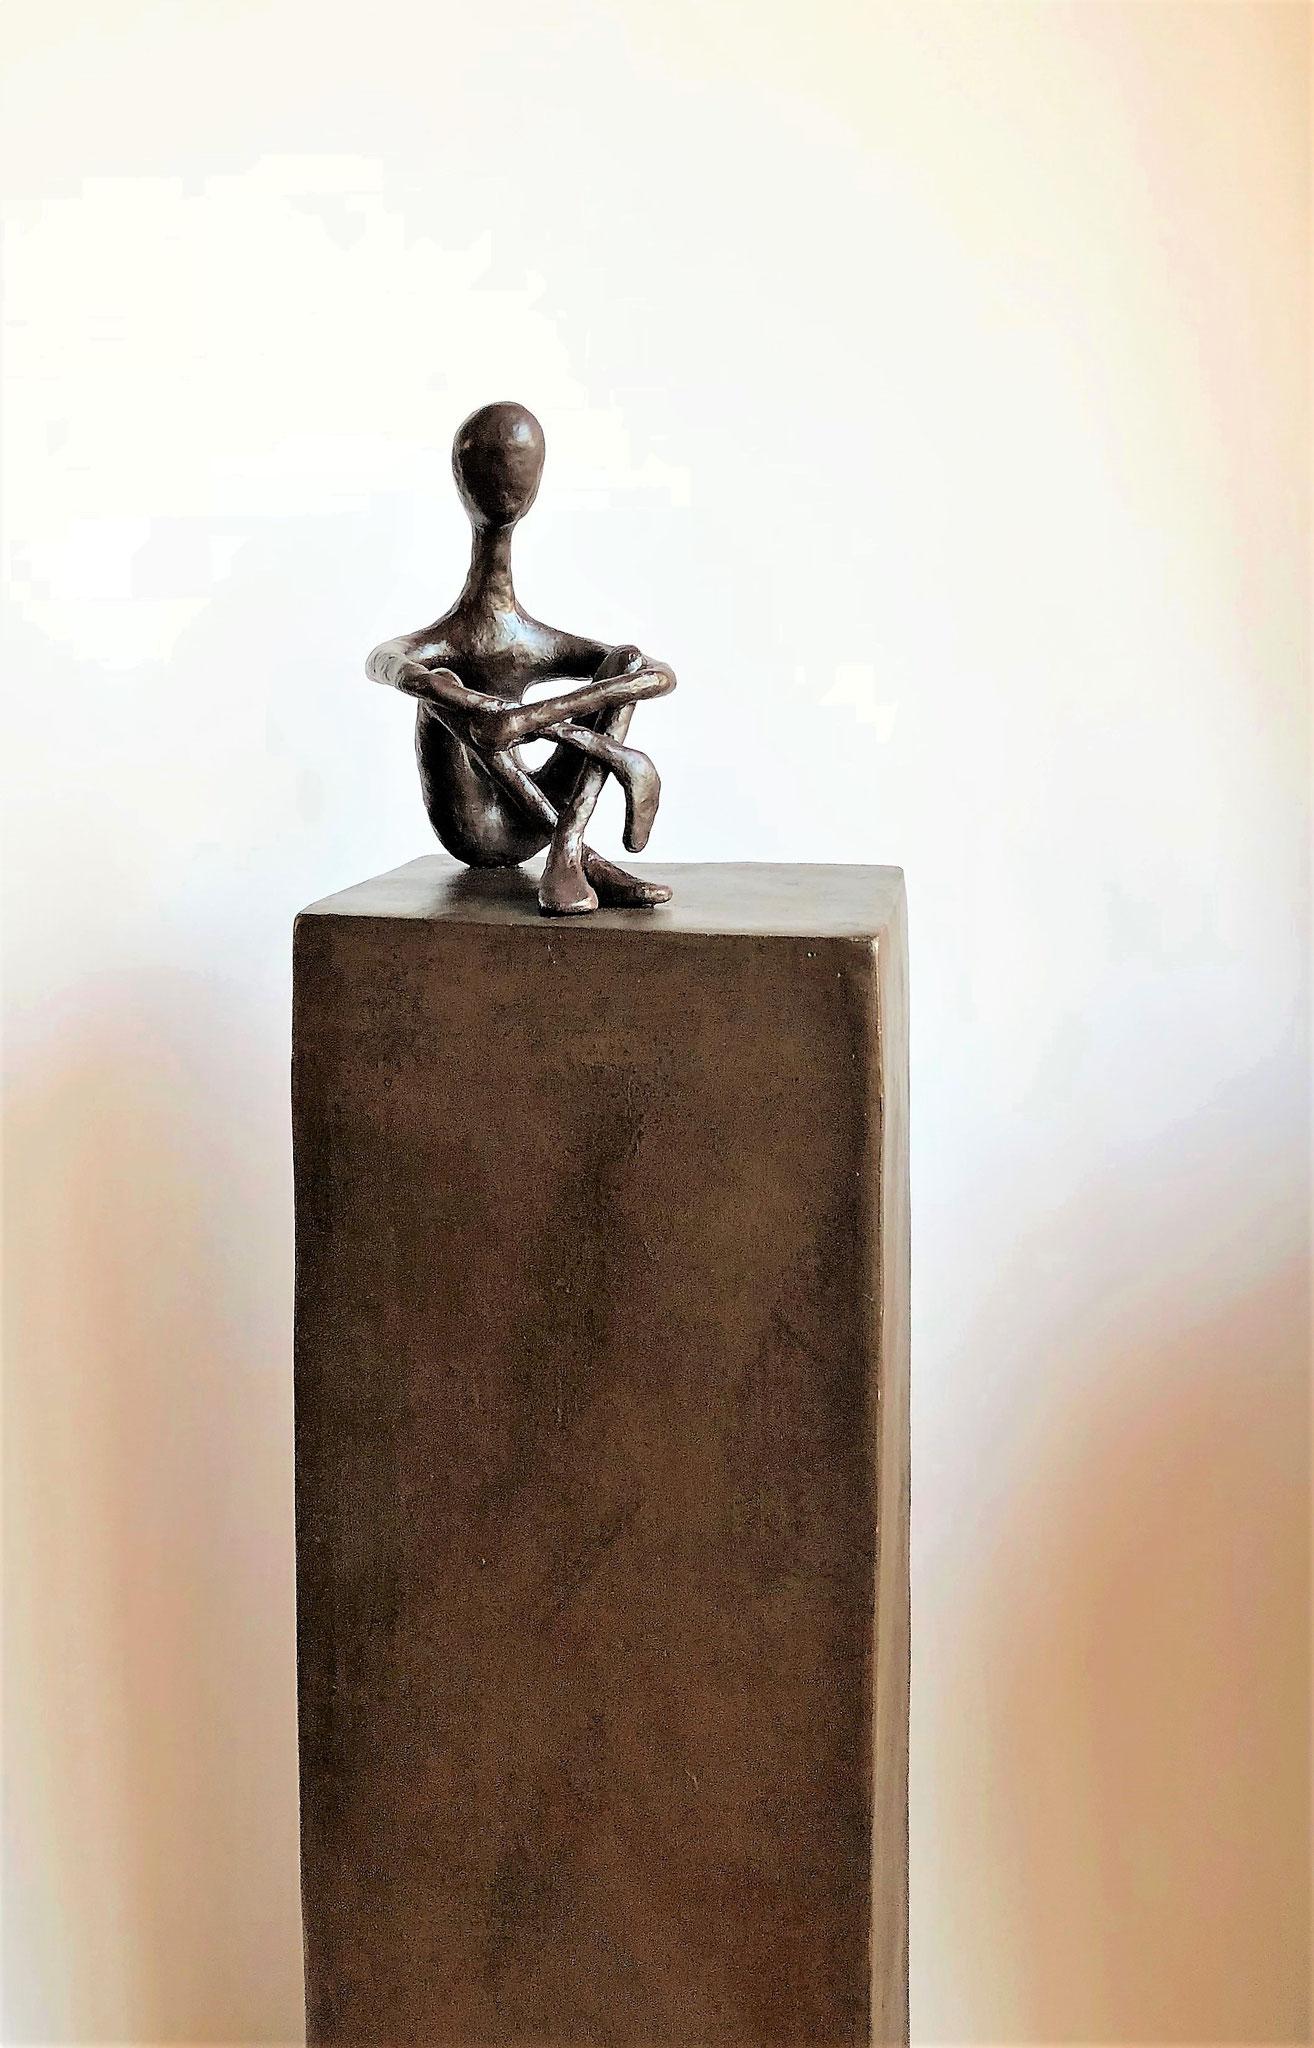 L'ermite - H80 x B20 x T16 cm